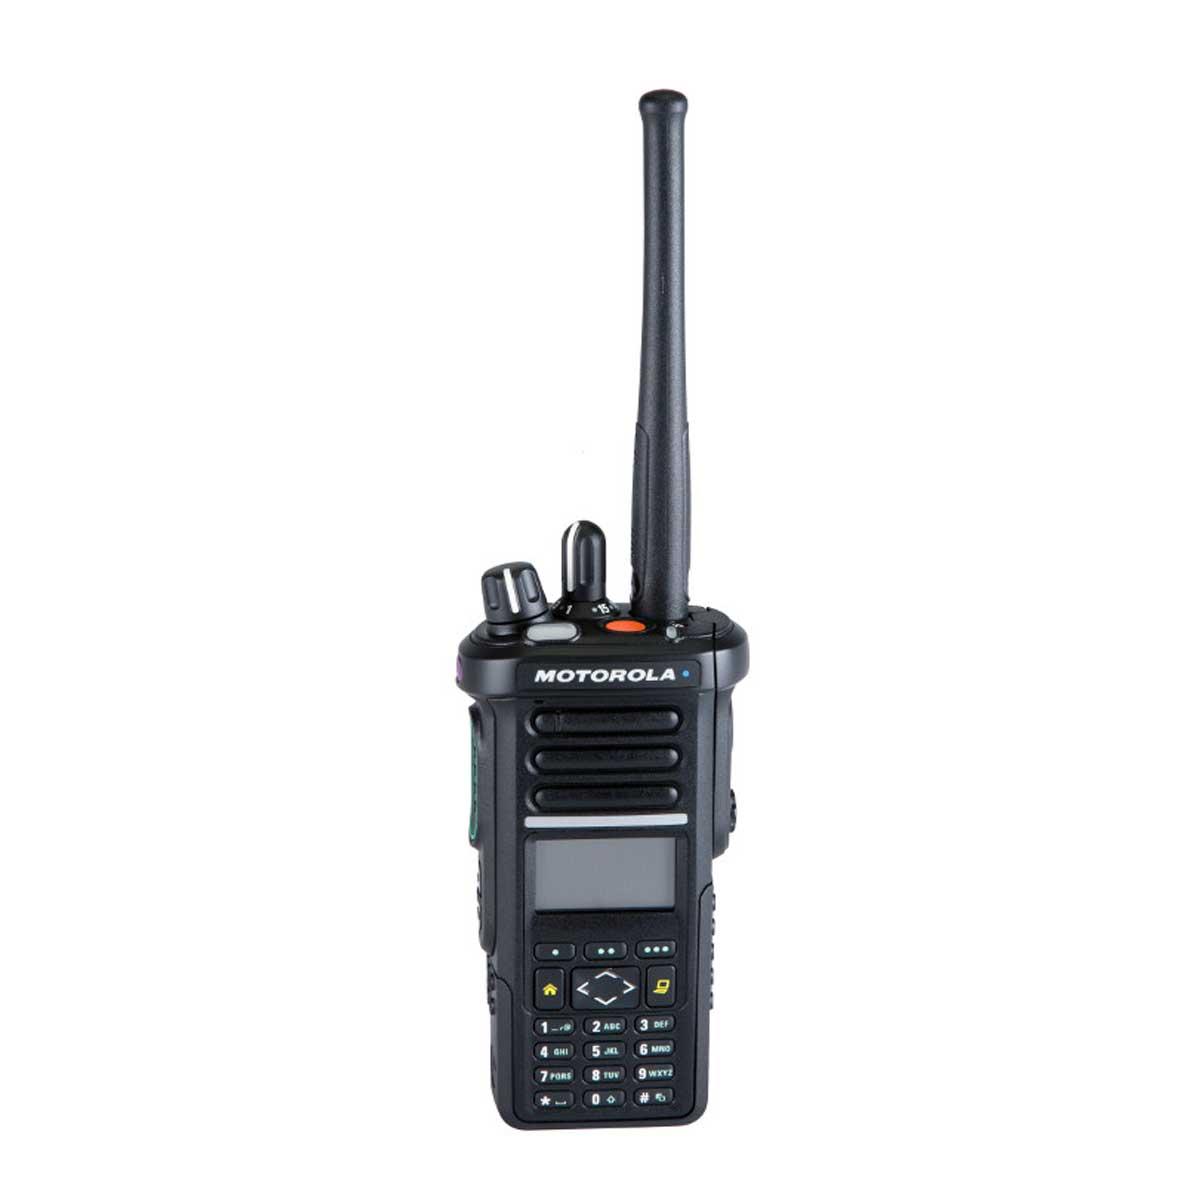 Radio Portátil Motorola P25 APX 2000 Pantalla / Teclado Completo